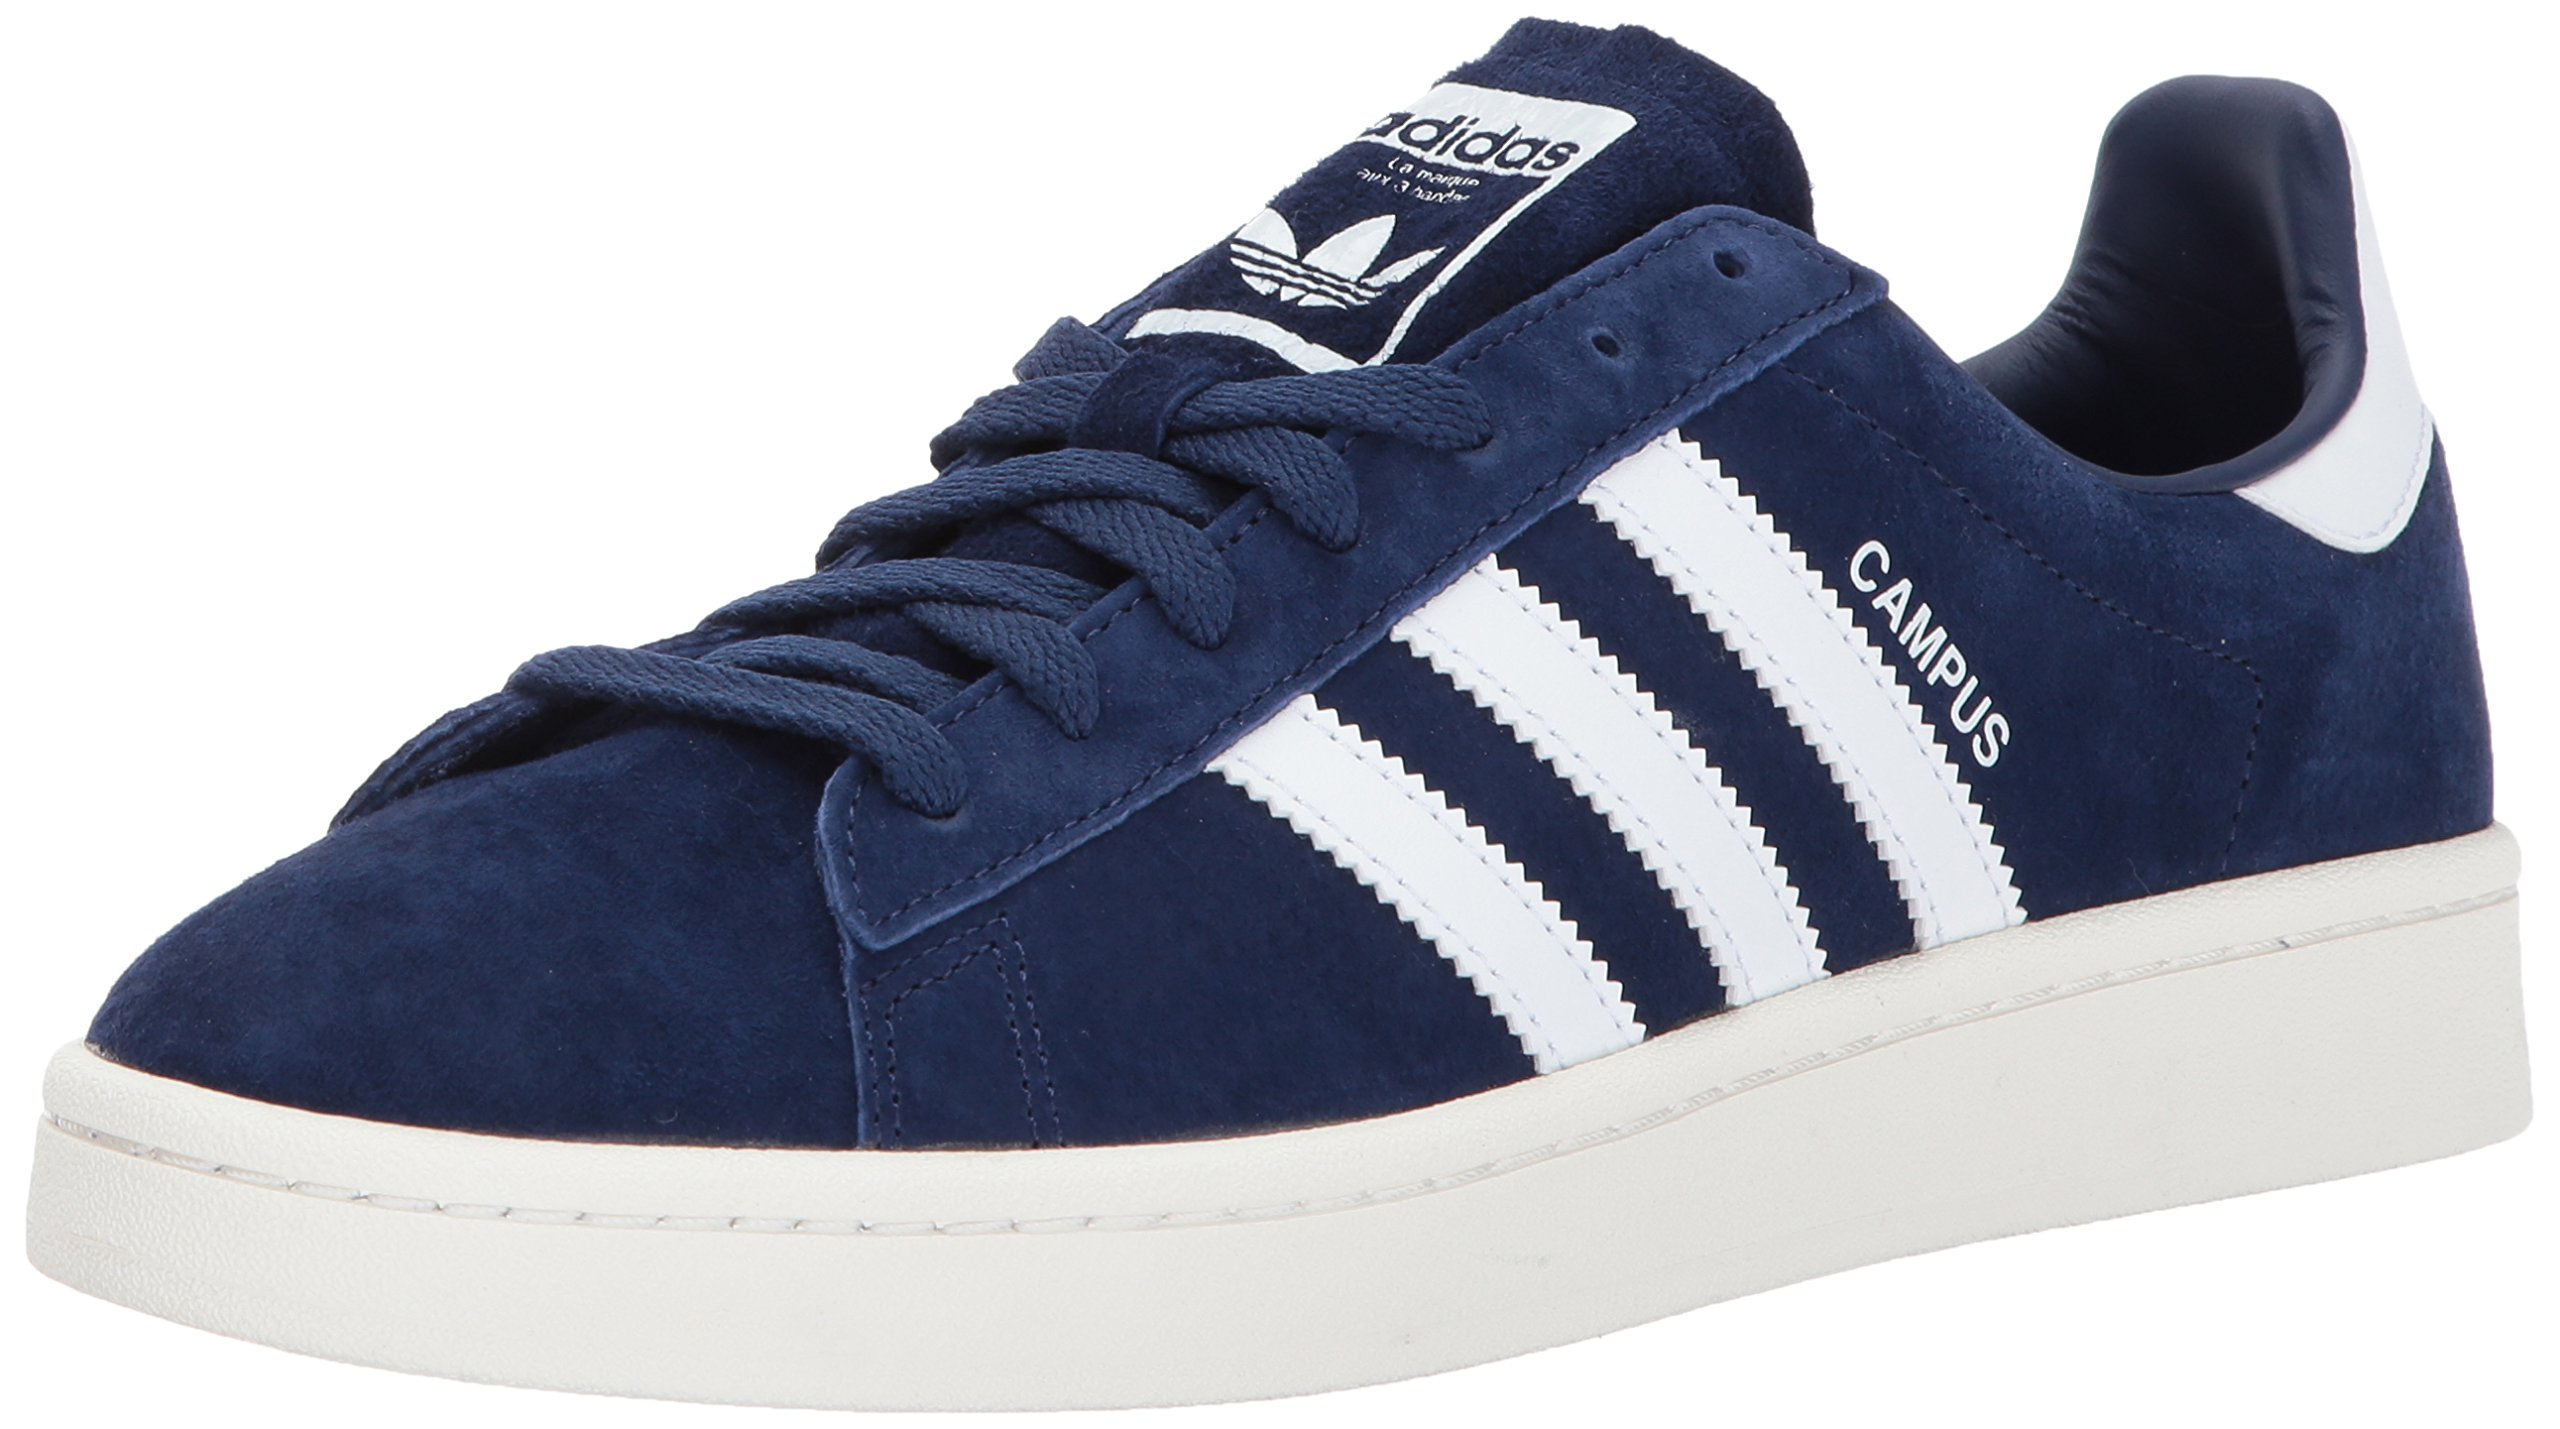 adidas Originals Men's Campus Sneakers, Dark Blue/White/Chalk White, (10 M US)